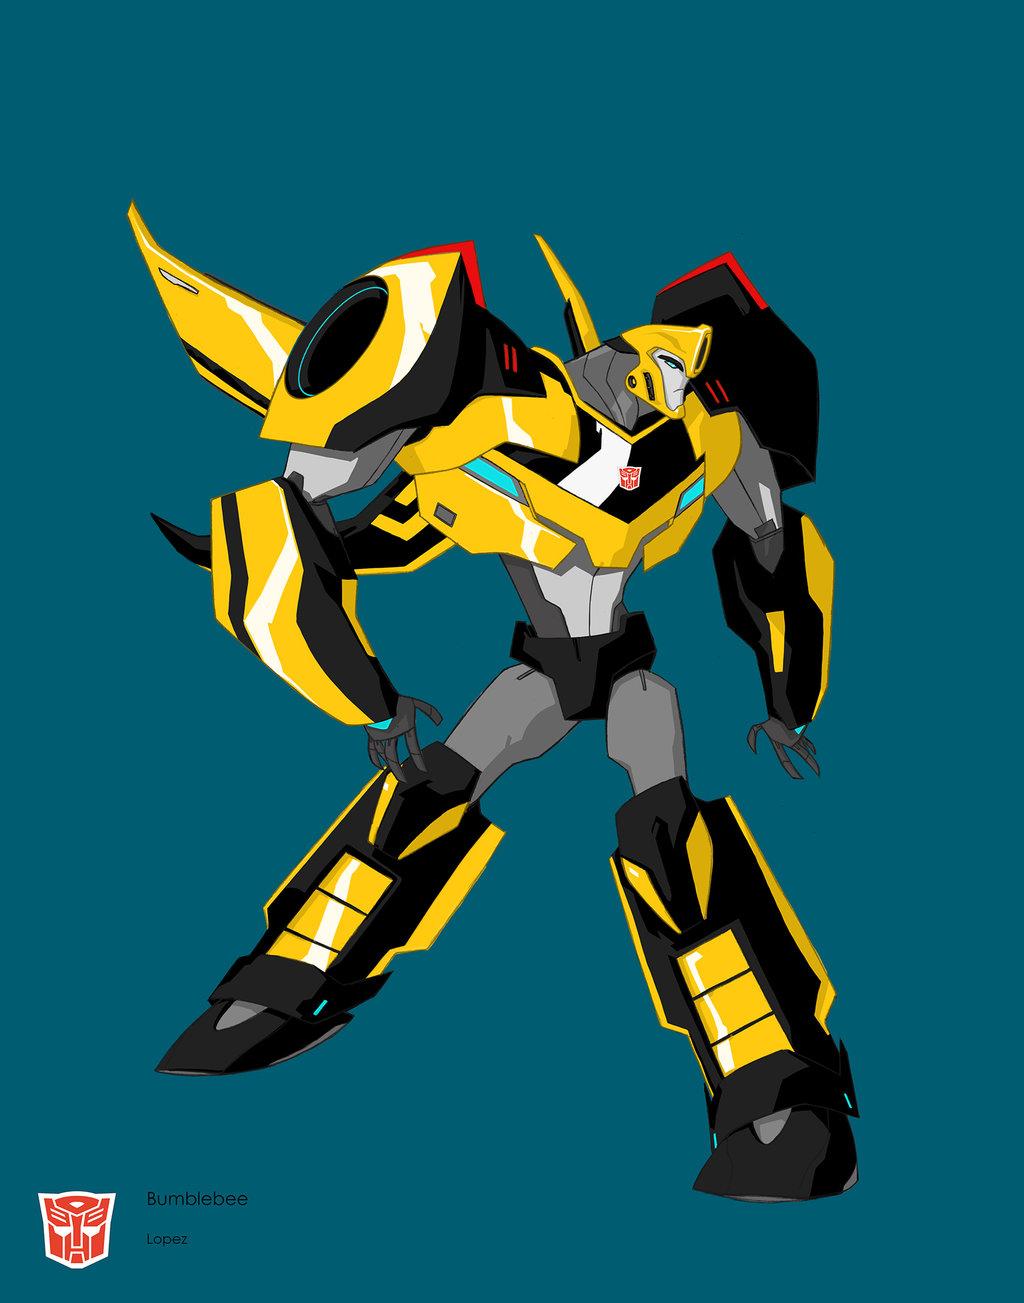 More Transformers Robots Disguise Concept Art Jose